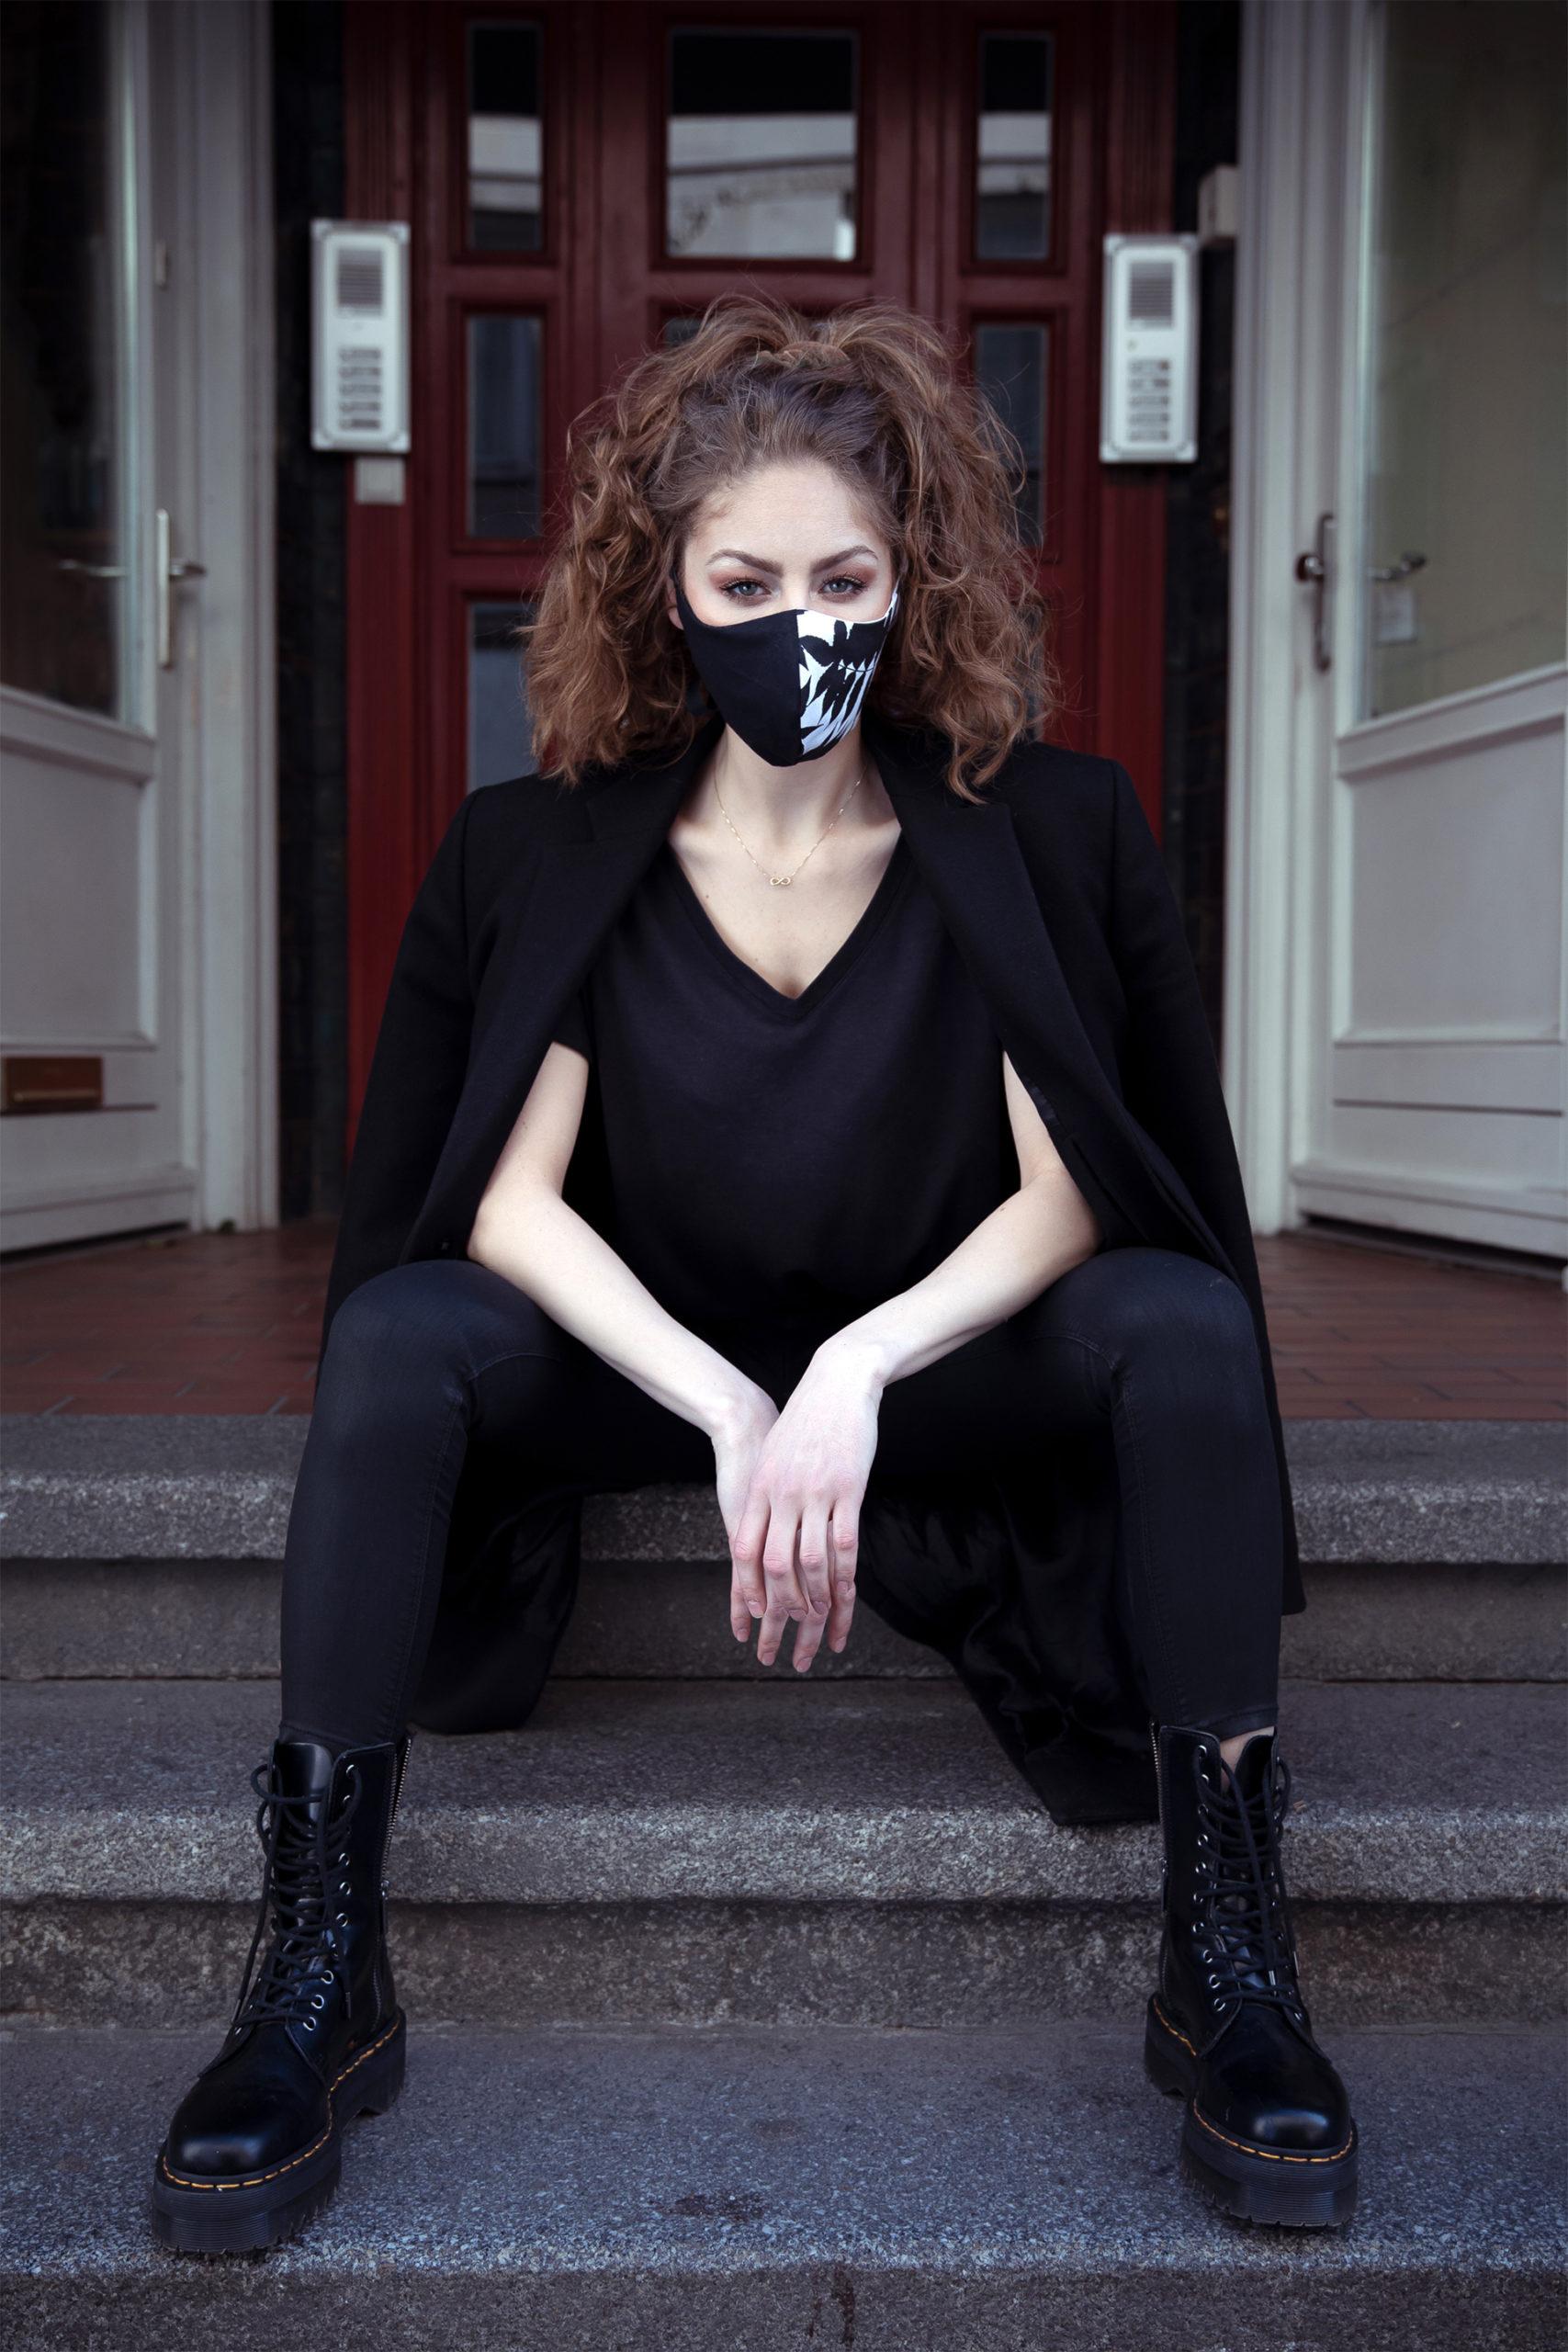 Maske Schwarz/Weiß Essigbaum